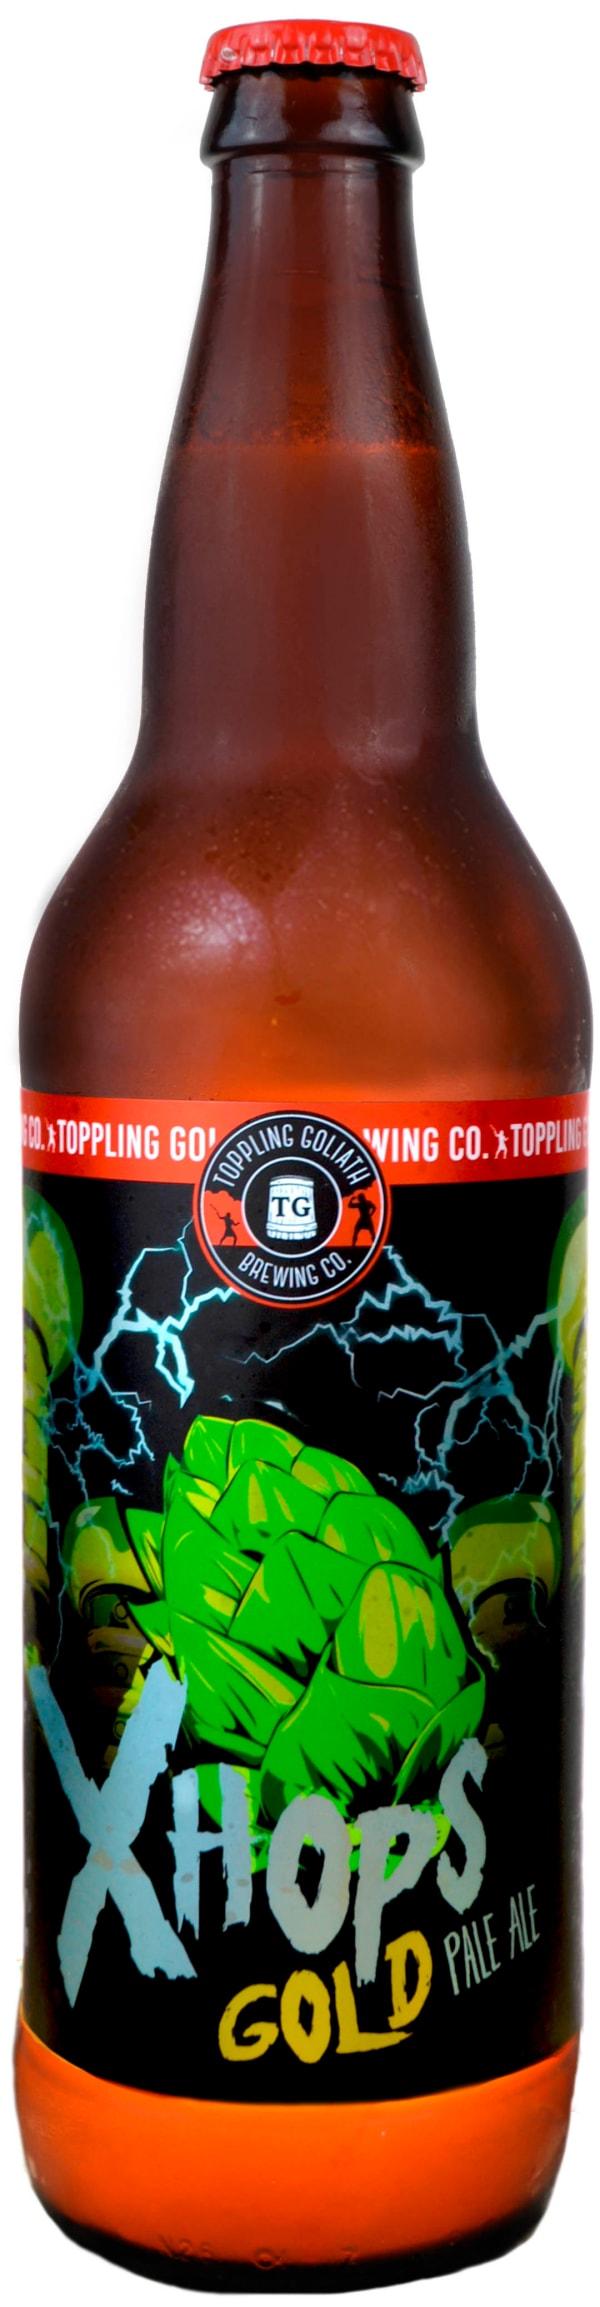 Toppling Goliath Xhops Gold Pale Ale